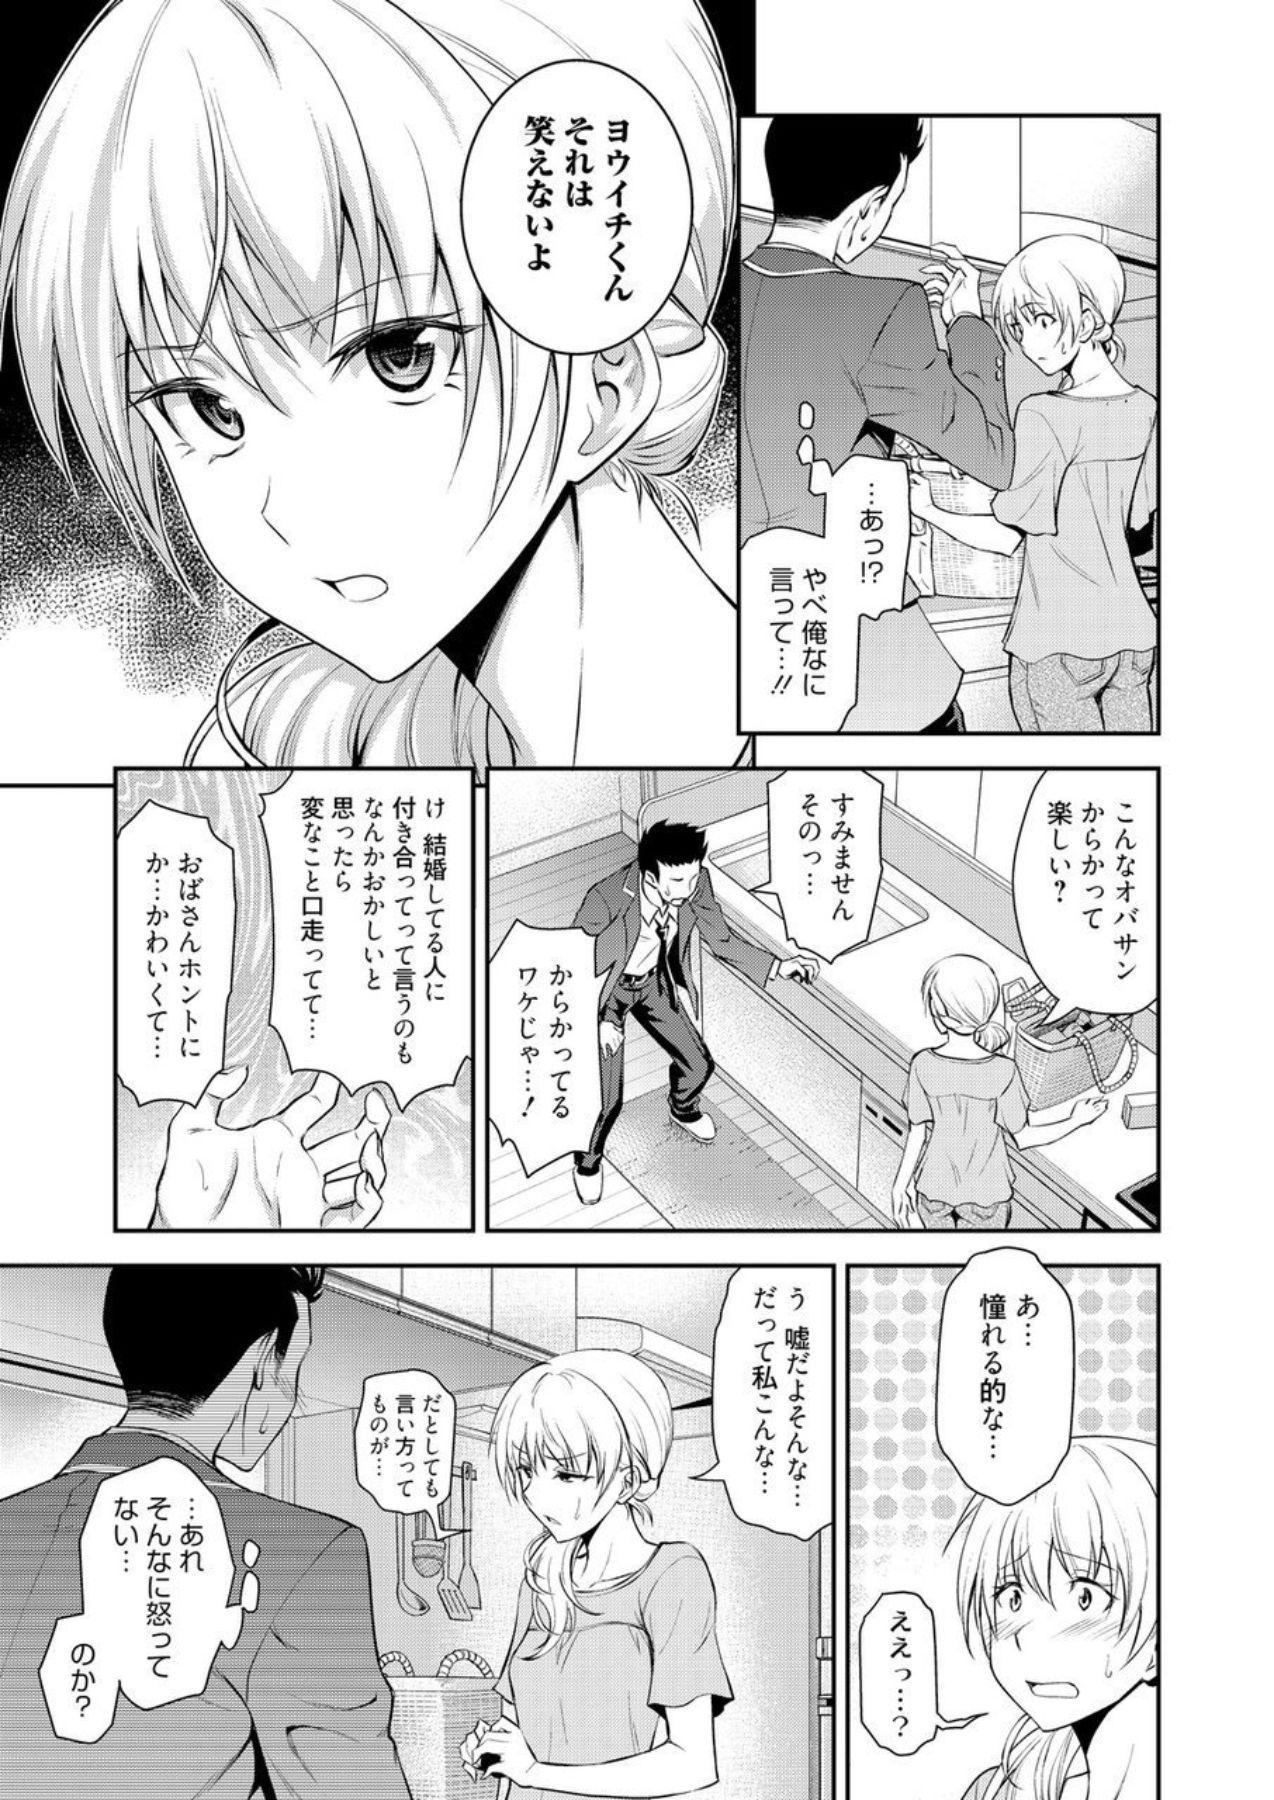 Doukyuusei no Wakai Haha 5